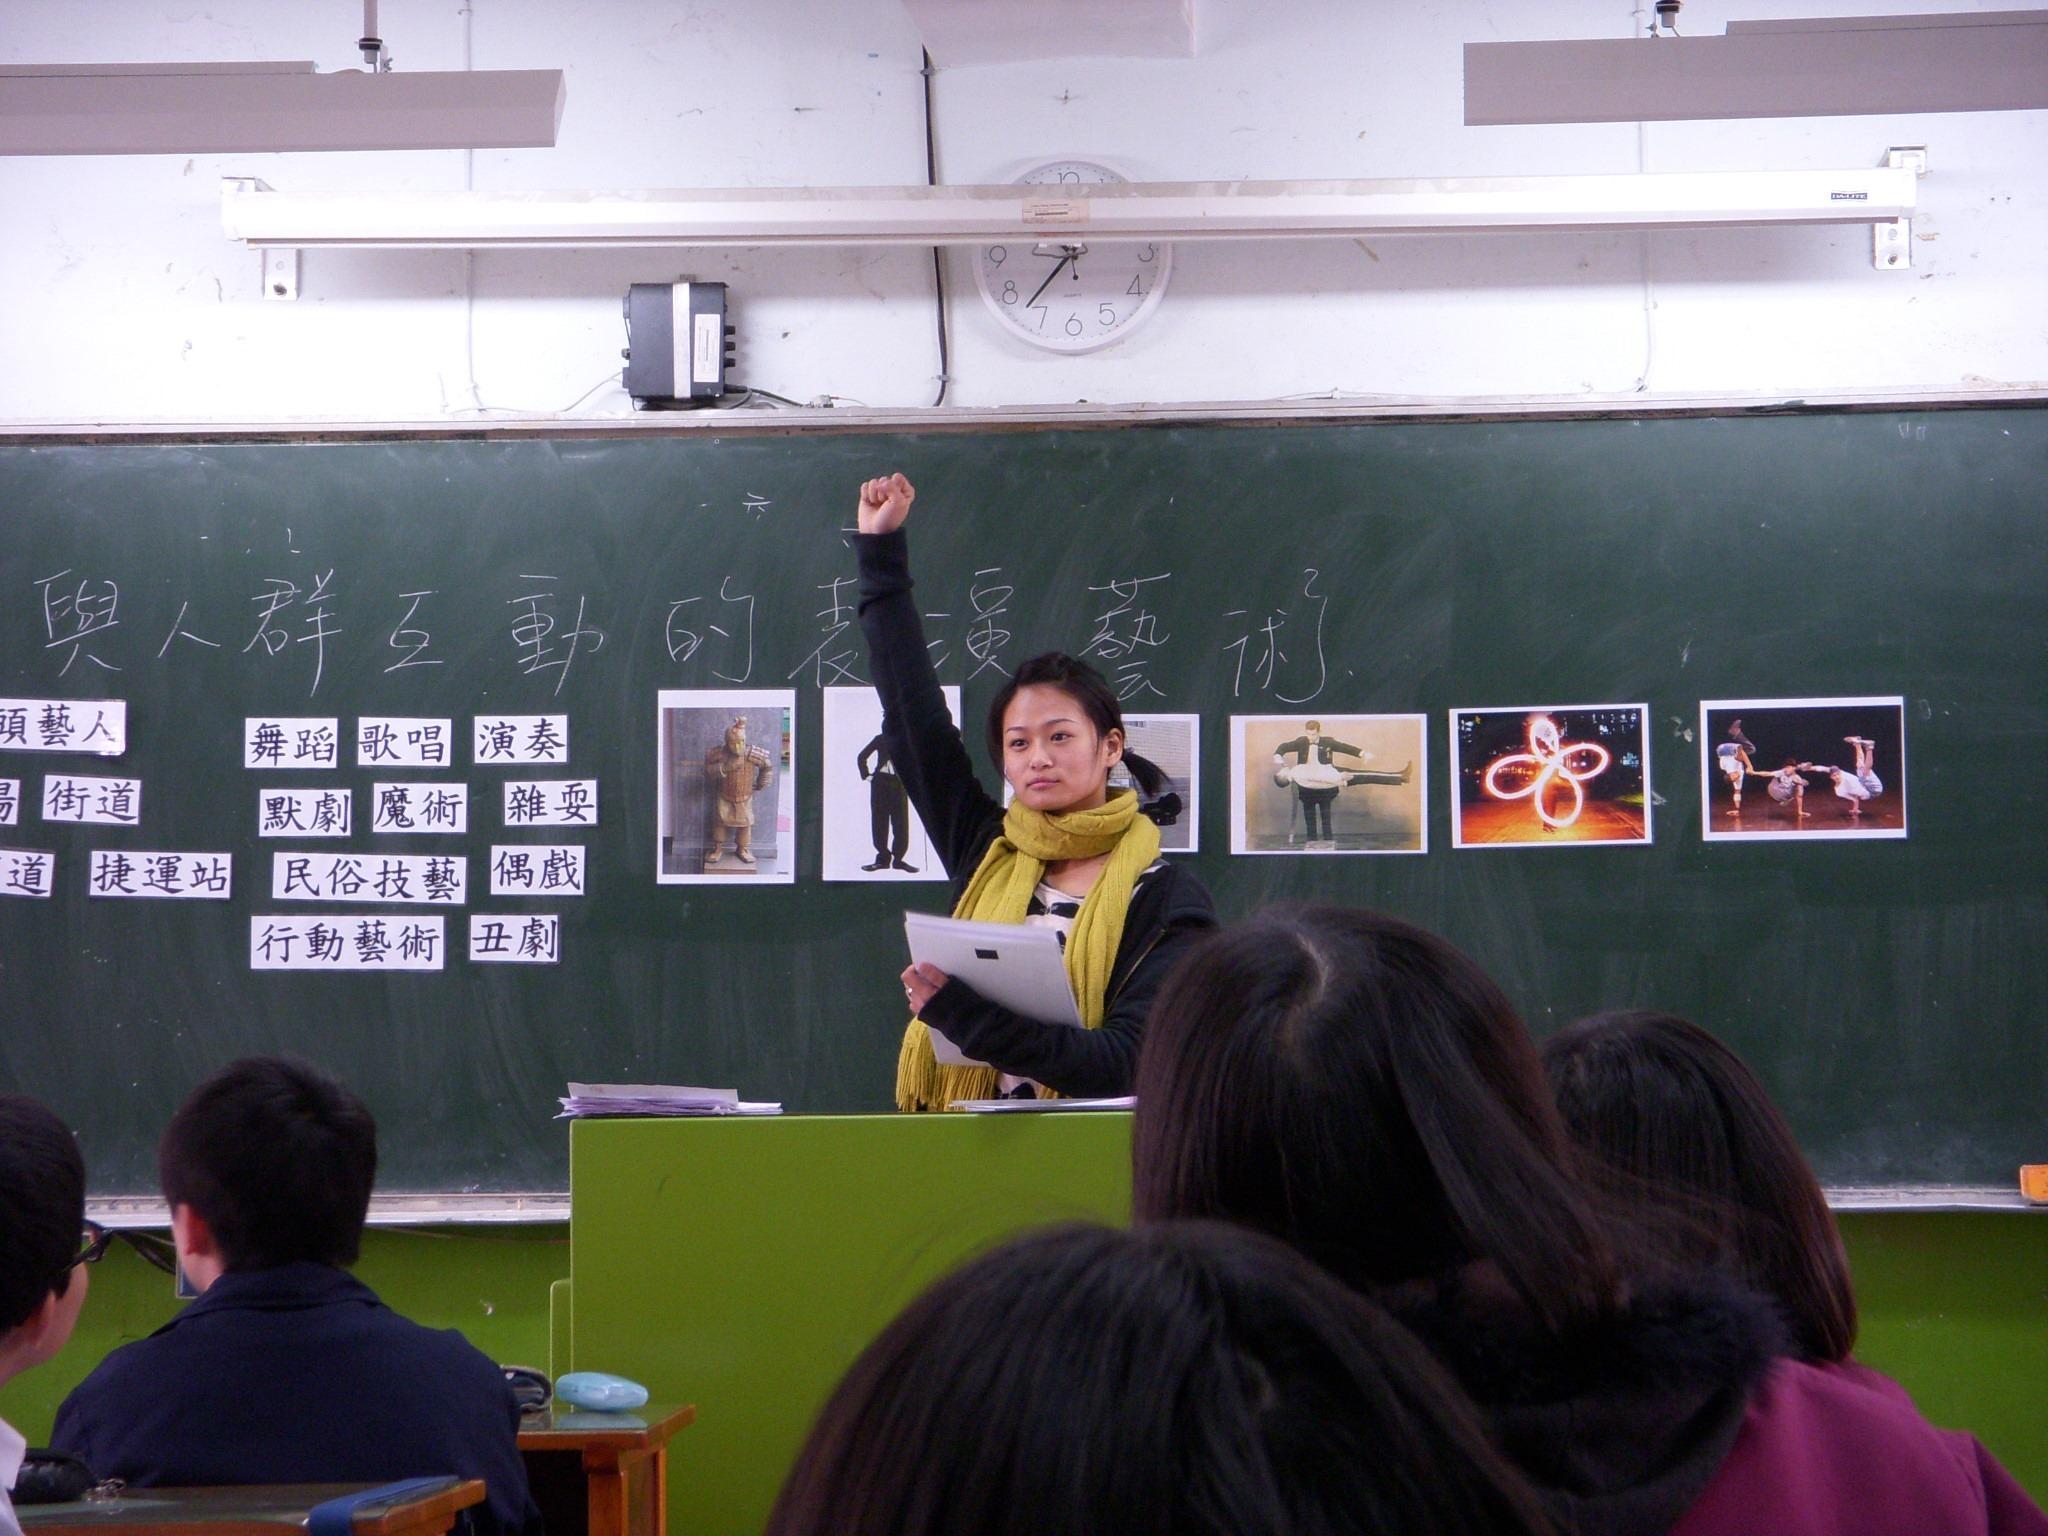 Tifiya也曾擔任國中表演藝術教師。Tifiya提供